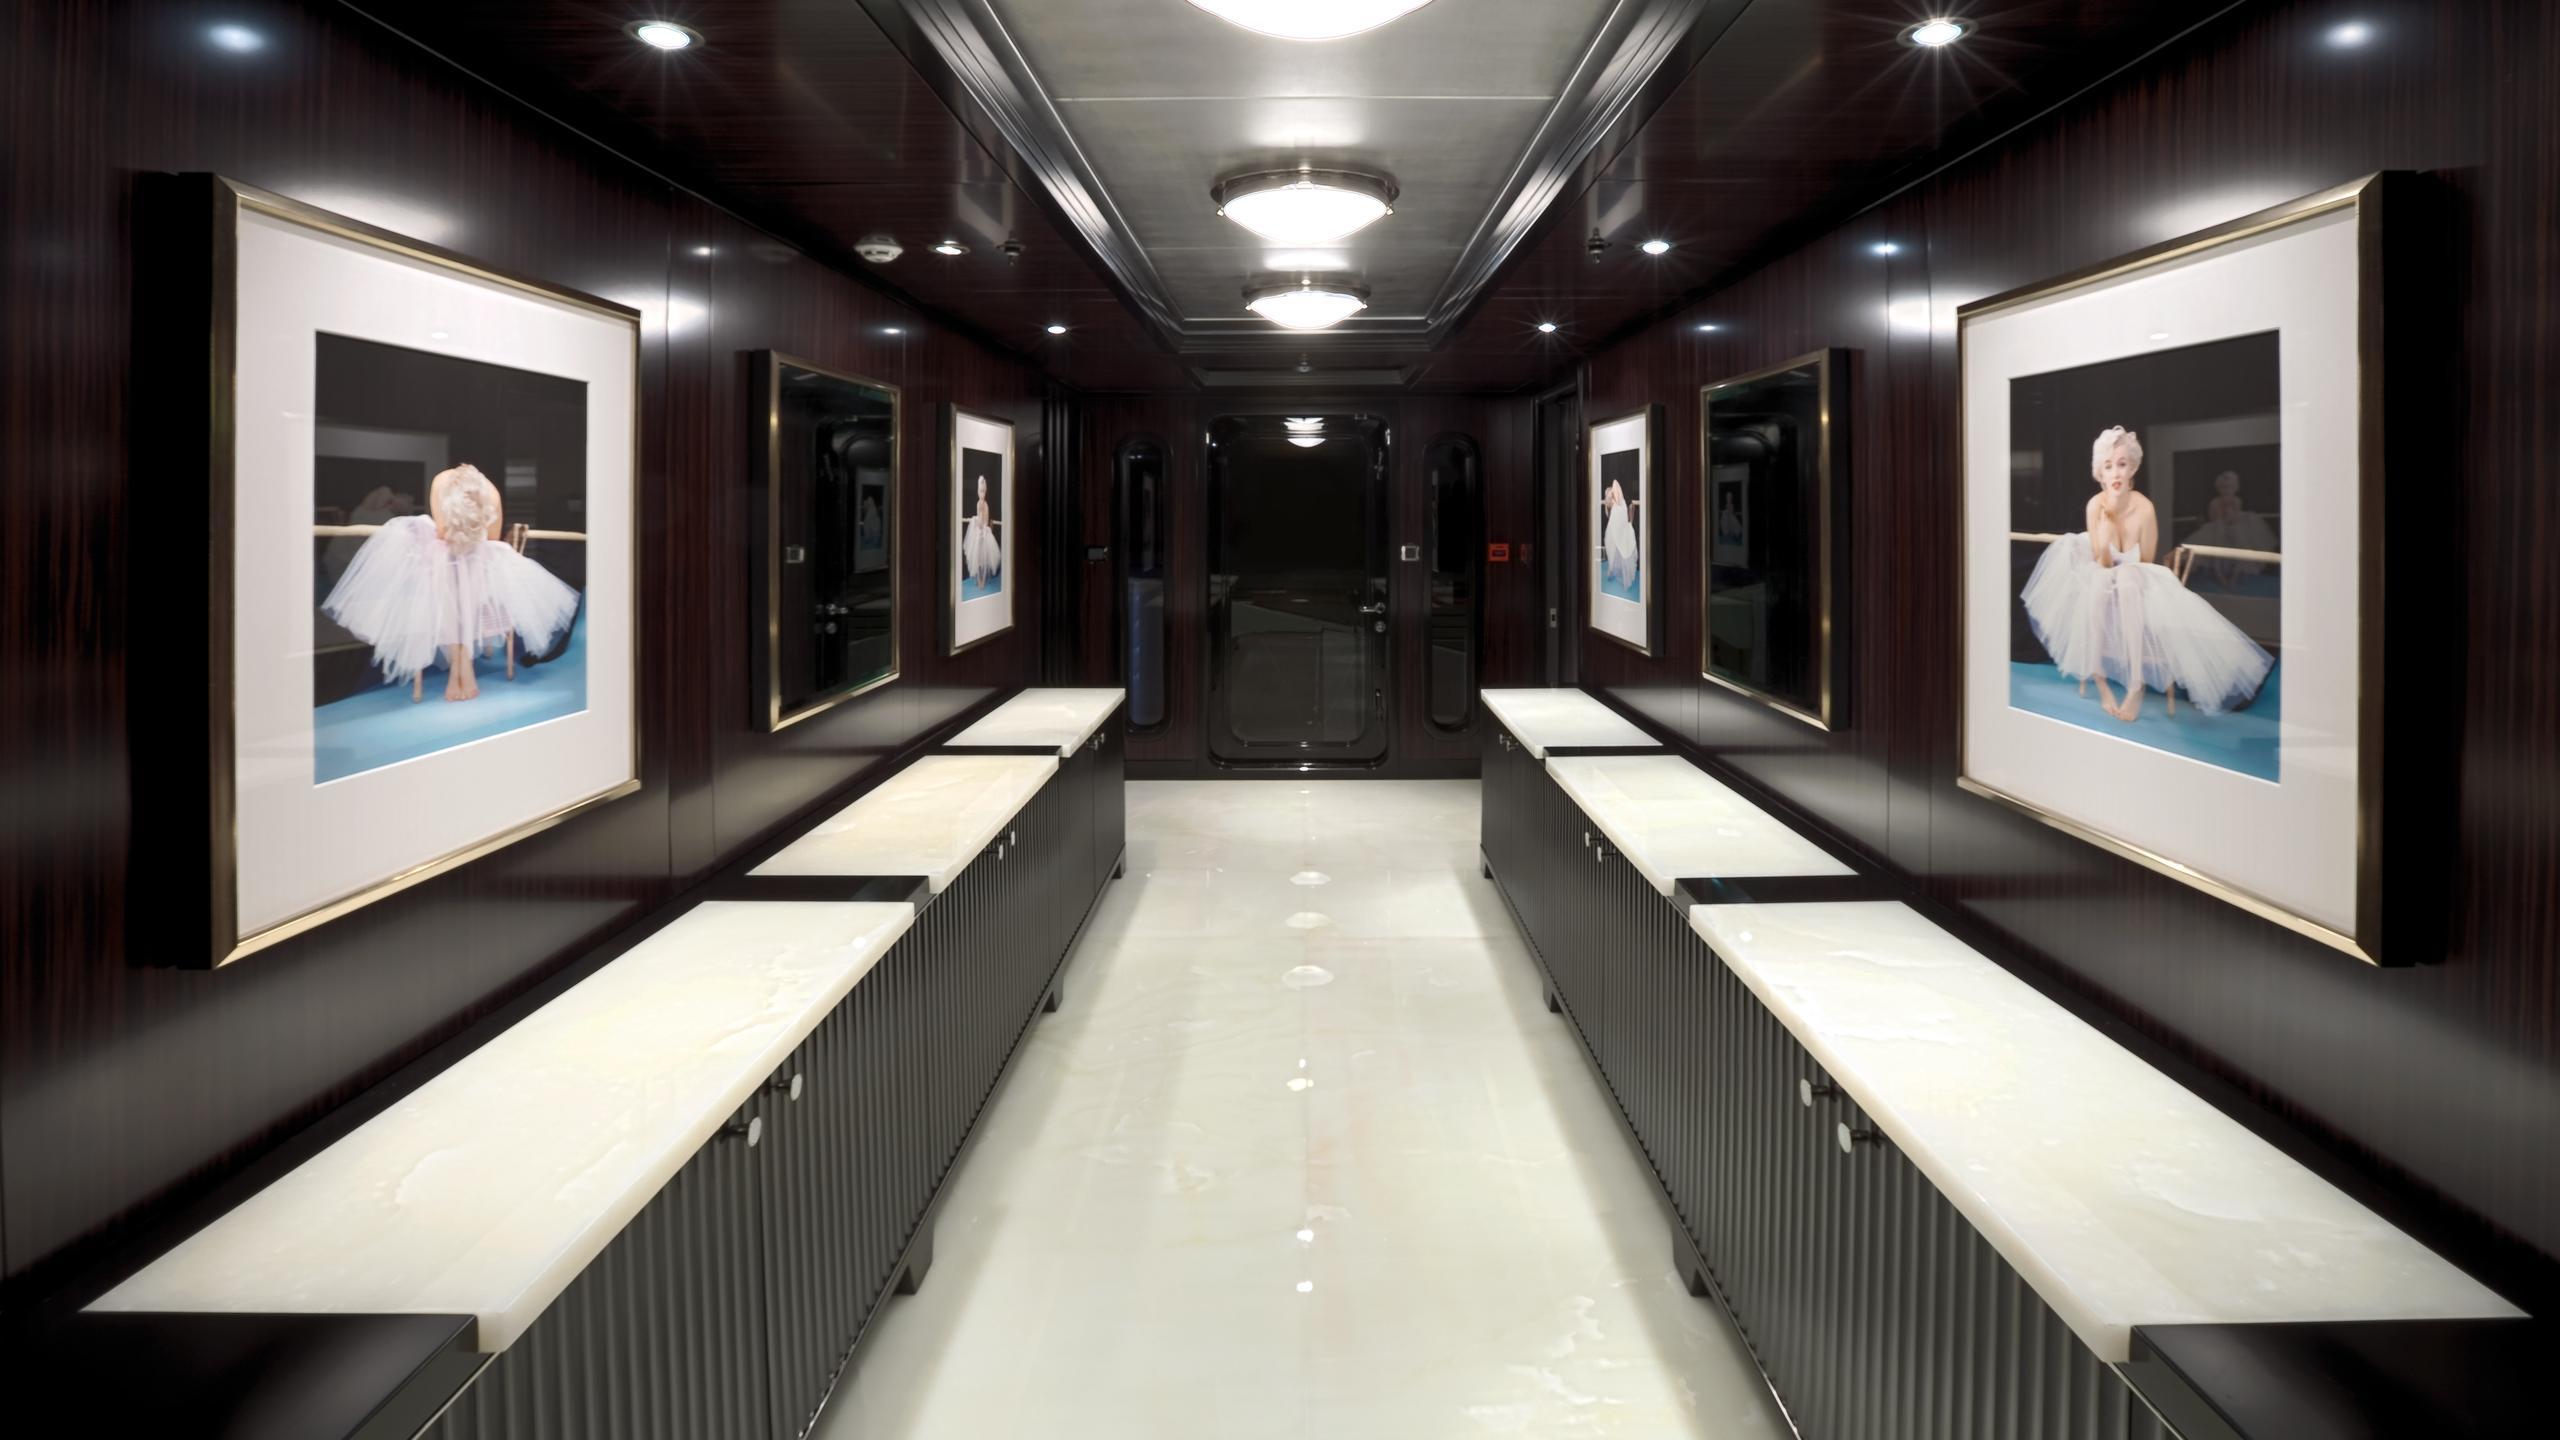 CARPE-DIEM-motor-yacht-trinity-2011-58m-hallway